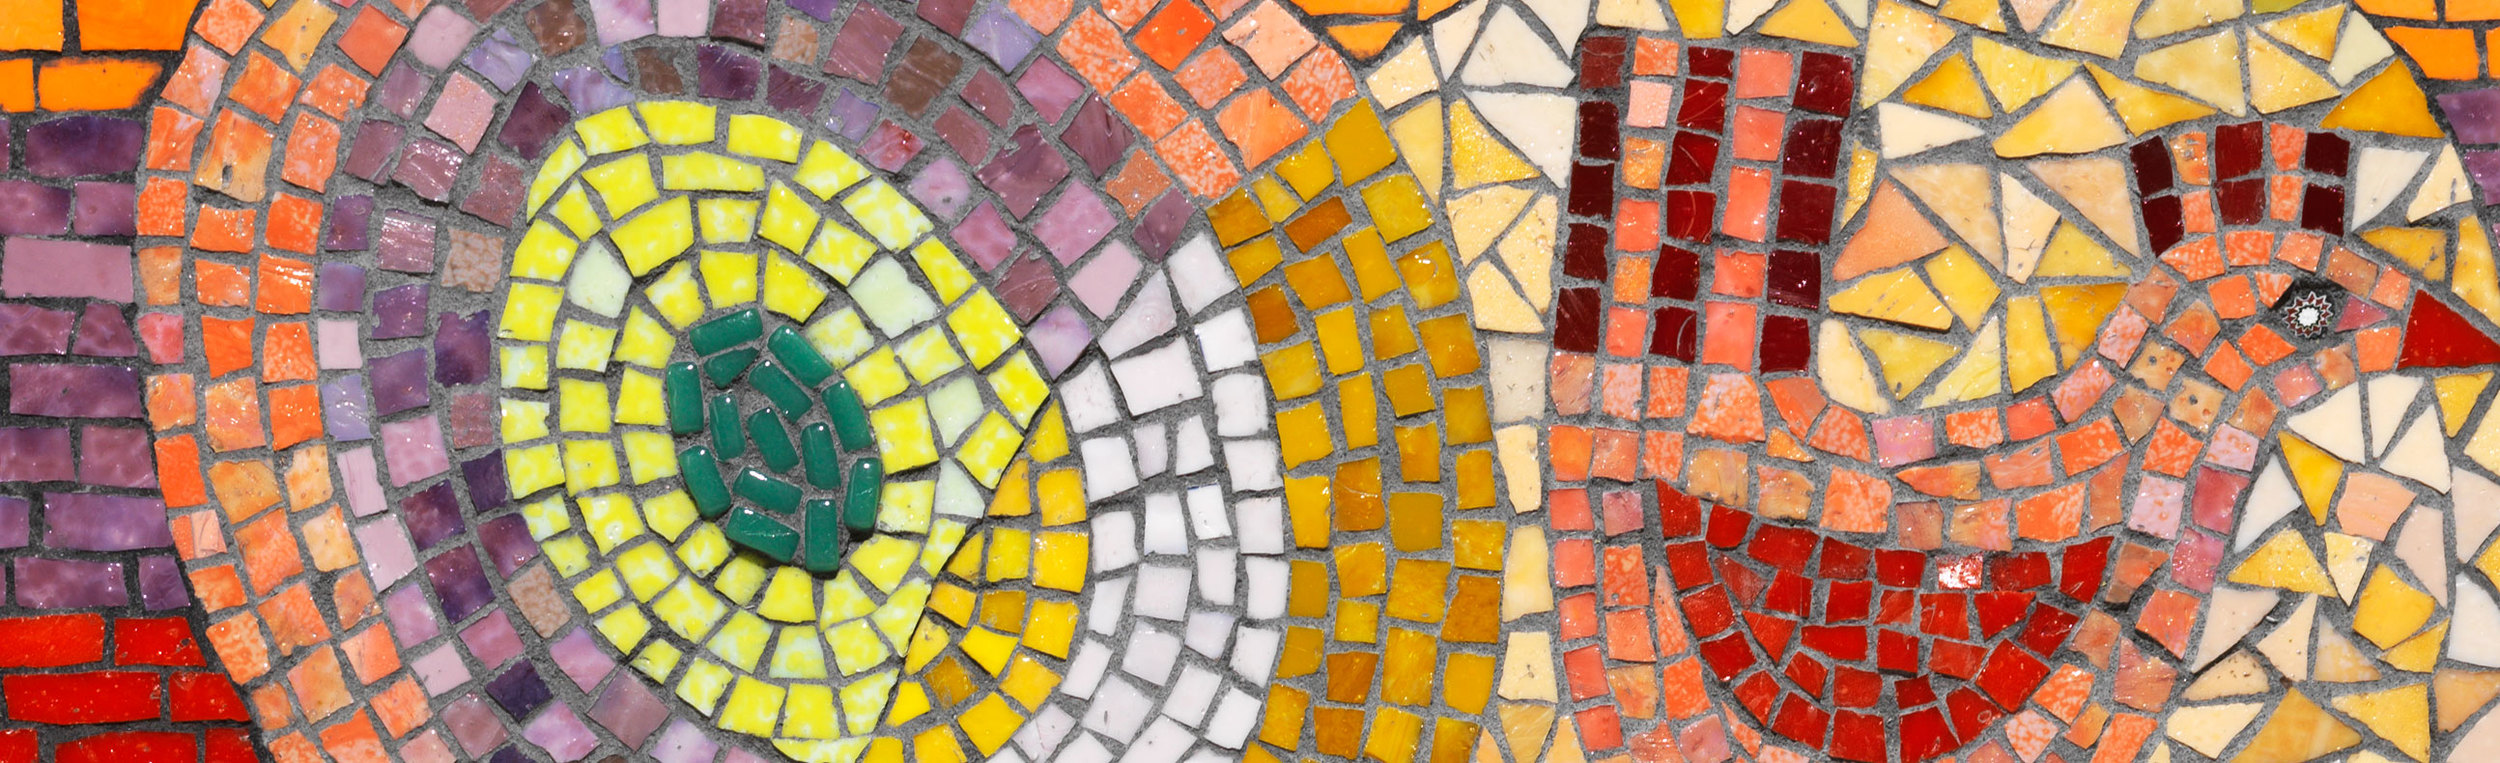 mosaic_artwork